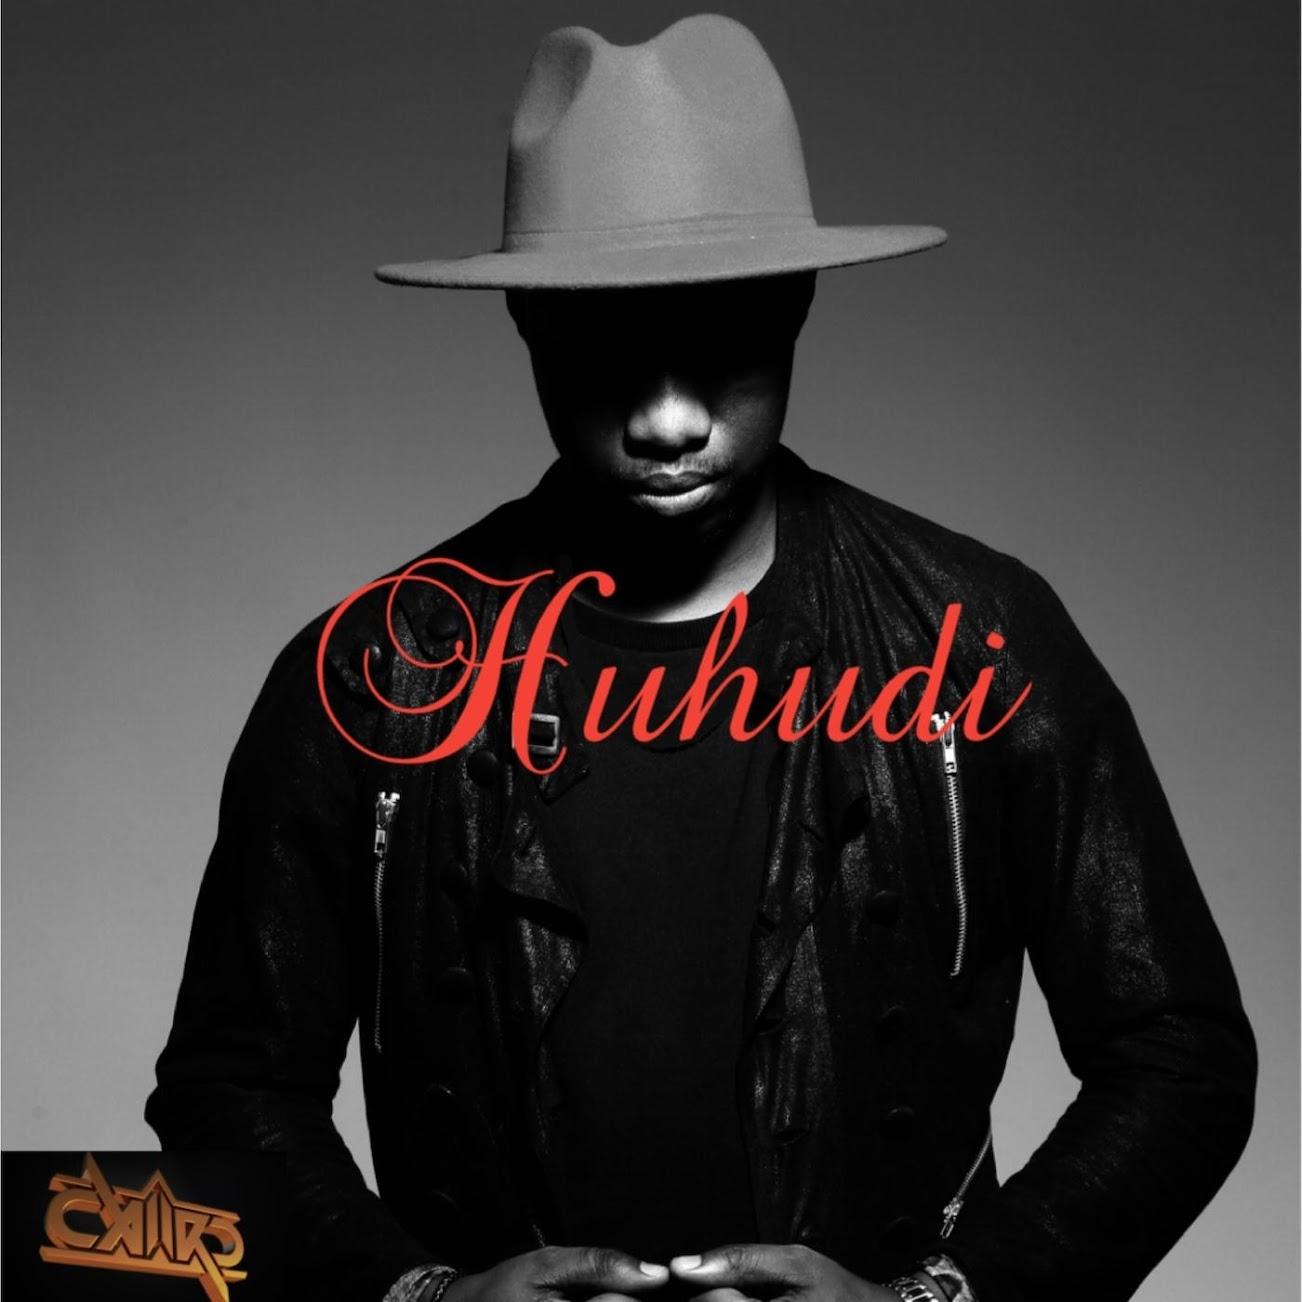 Caiiro - Huhudi Download mp3 • Bue de Musica